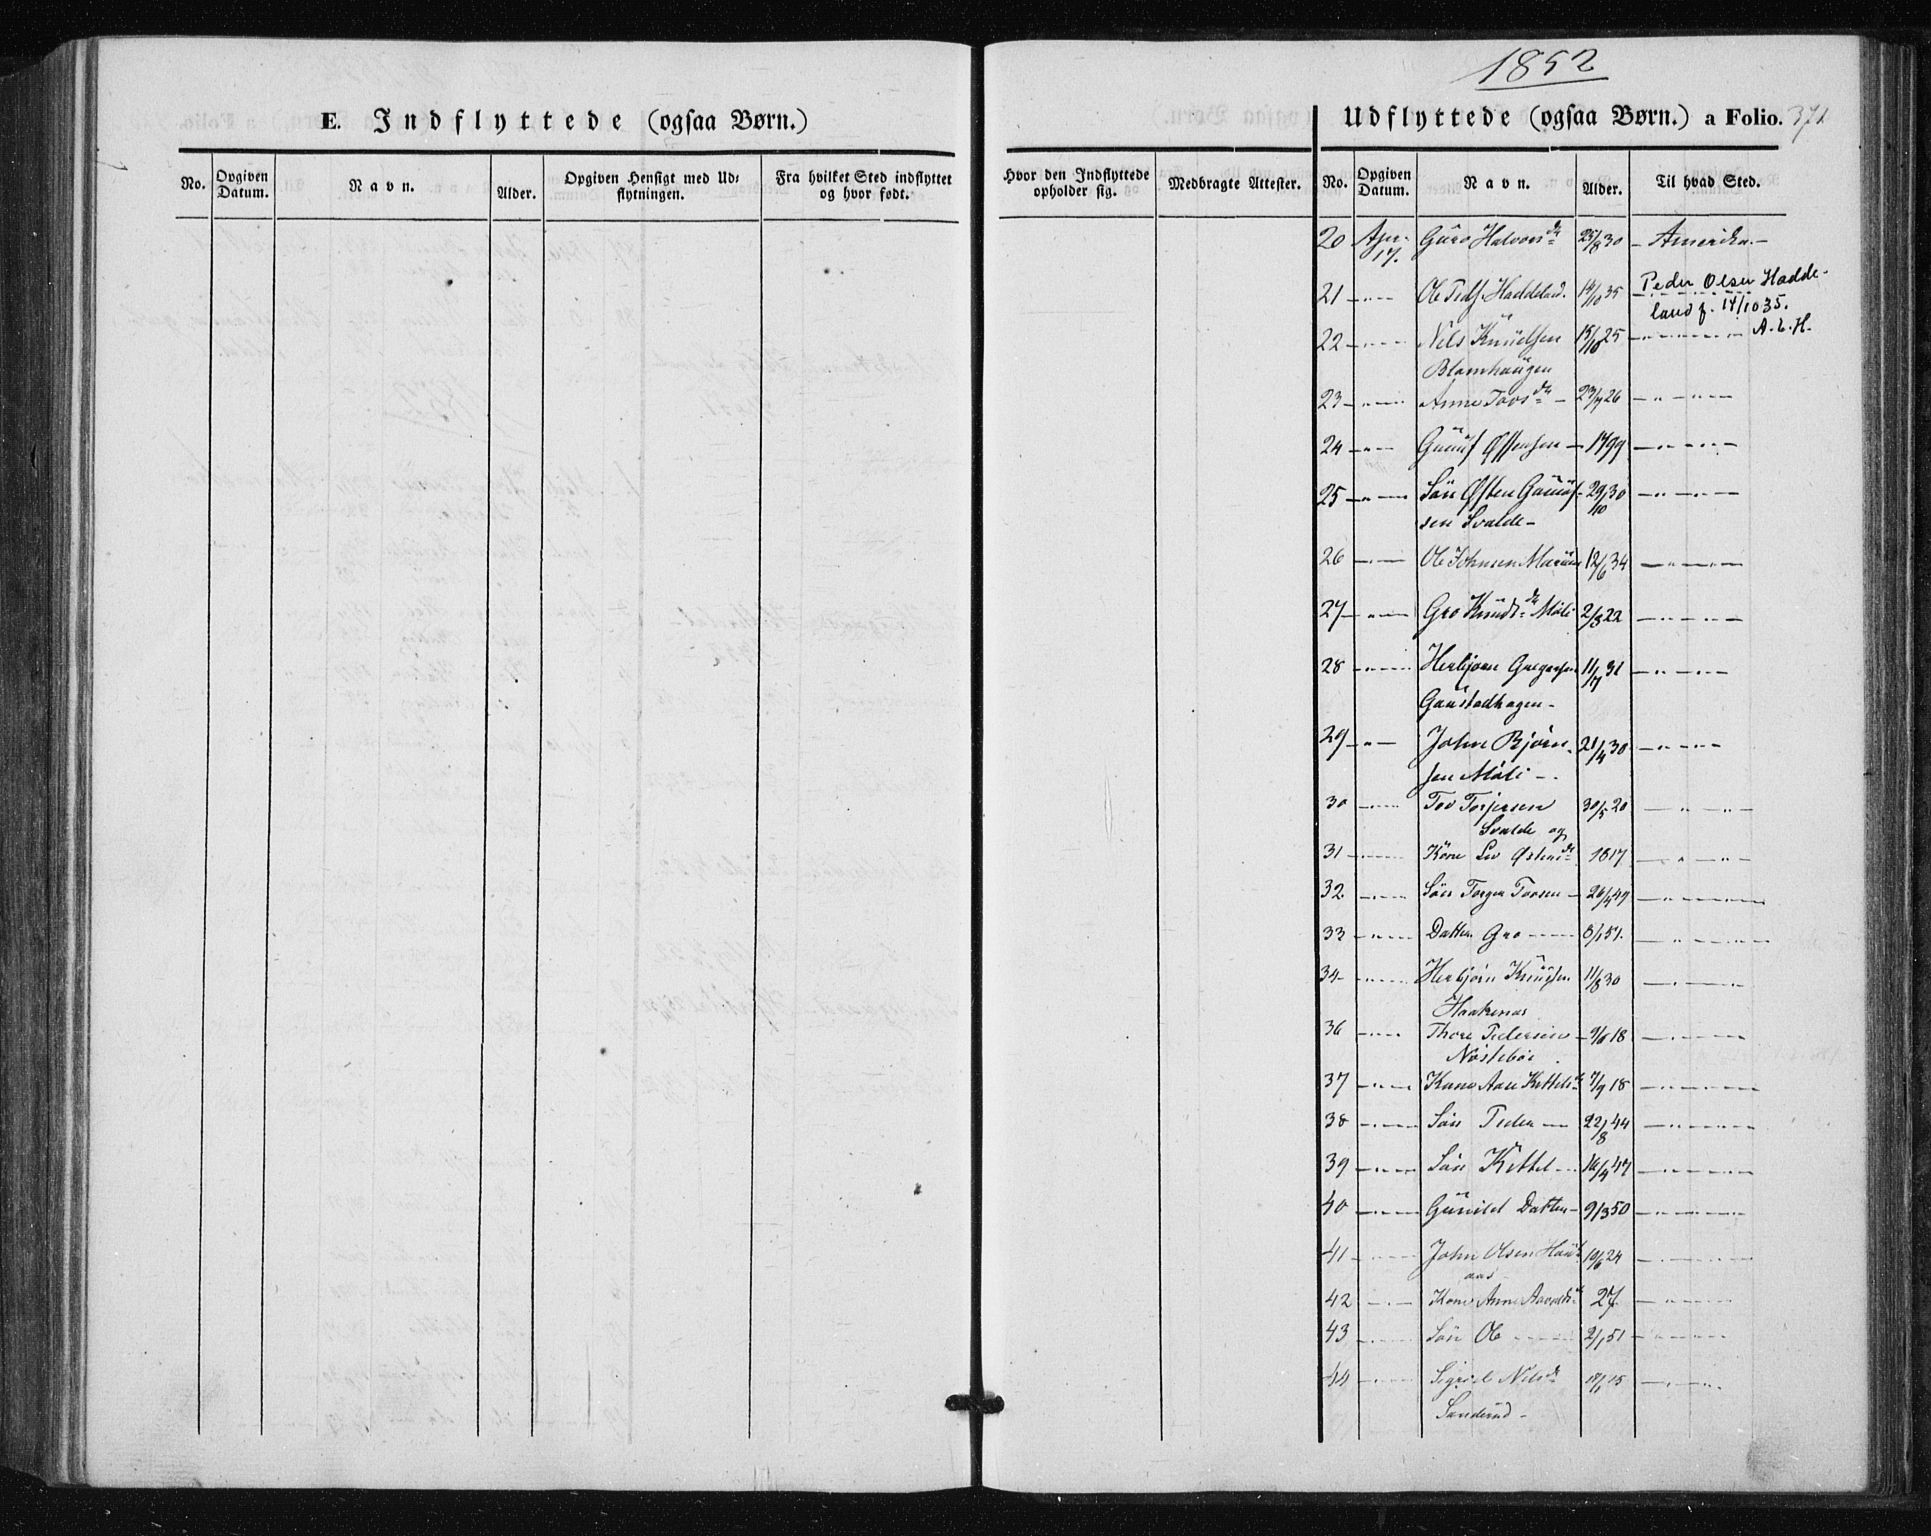 SAKO, Tinn kirkebøker, F/Fa/L0005: Ministerialbok nr. I 5, 1844-1856, s. 371